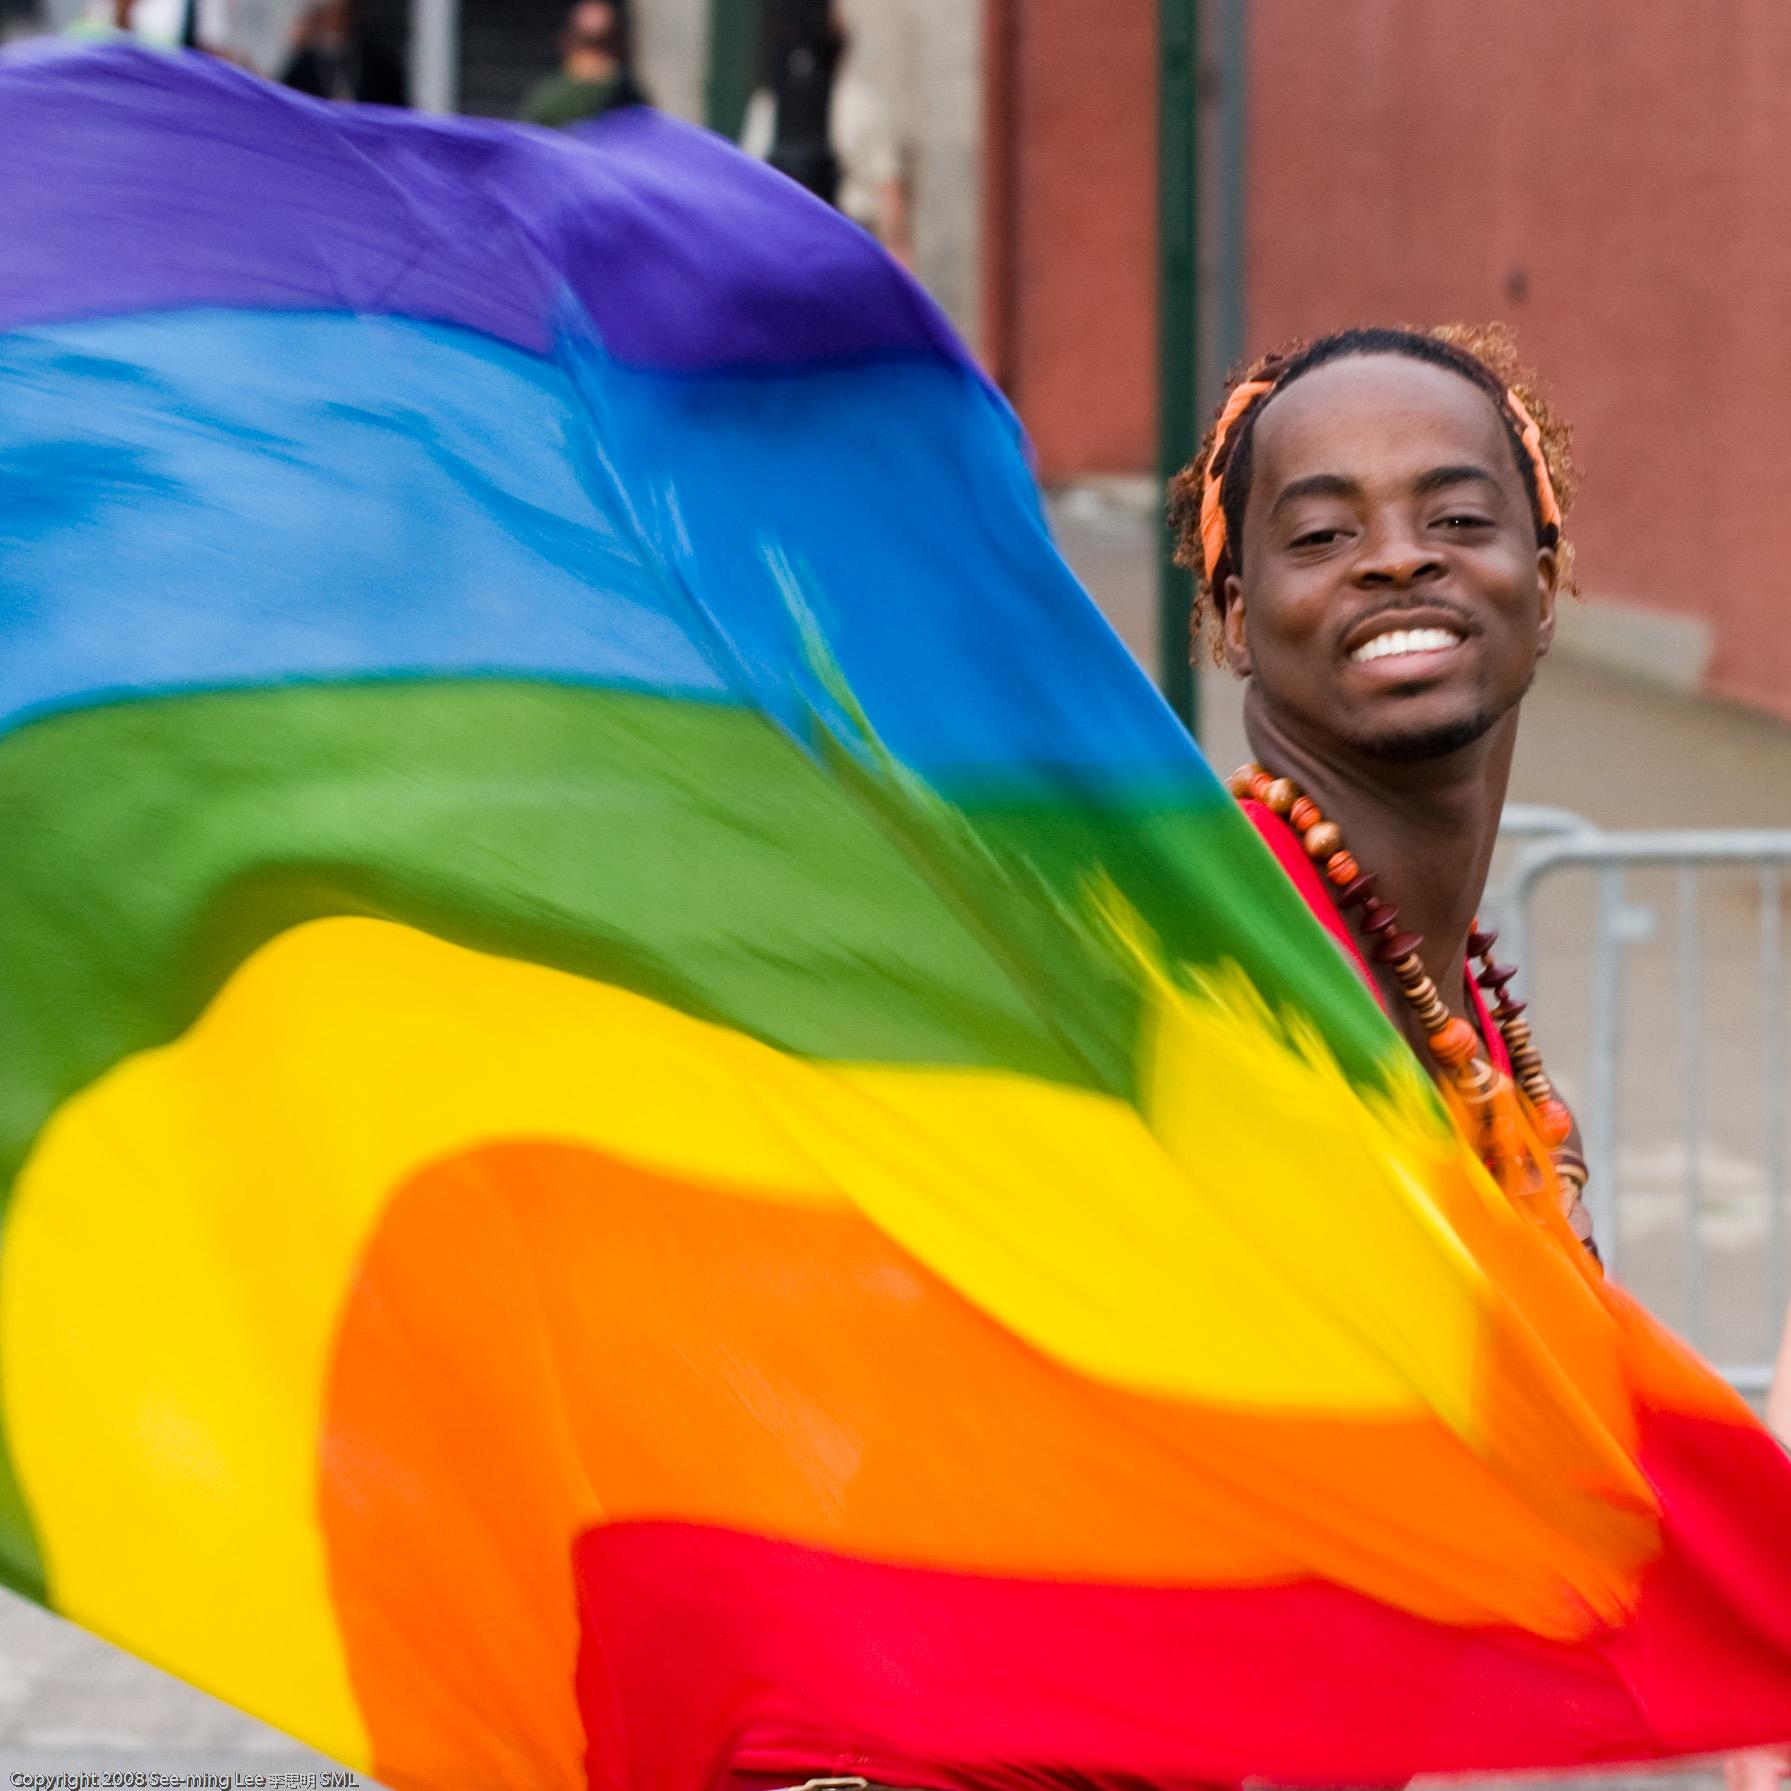 http://www.pressenza.com/wp-content/uploads/2012/11/Rainbow_Flag_Gay_Pride_New_York_2008.jpg